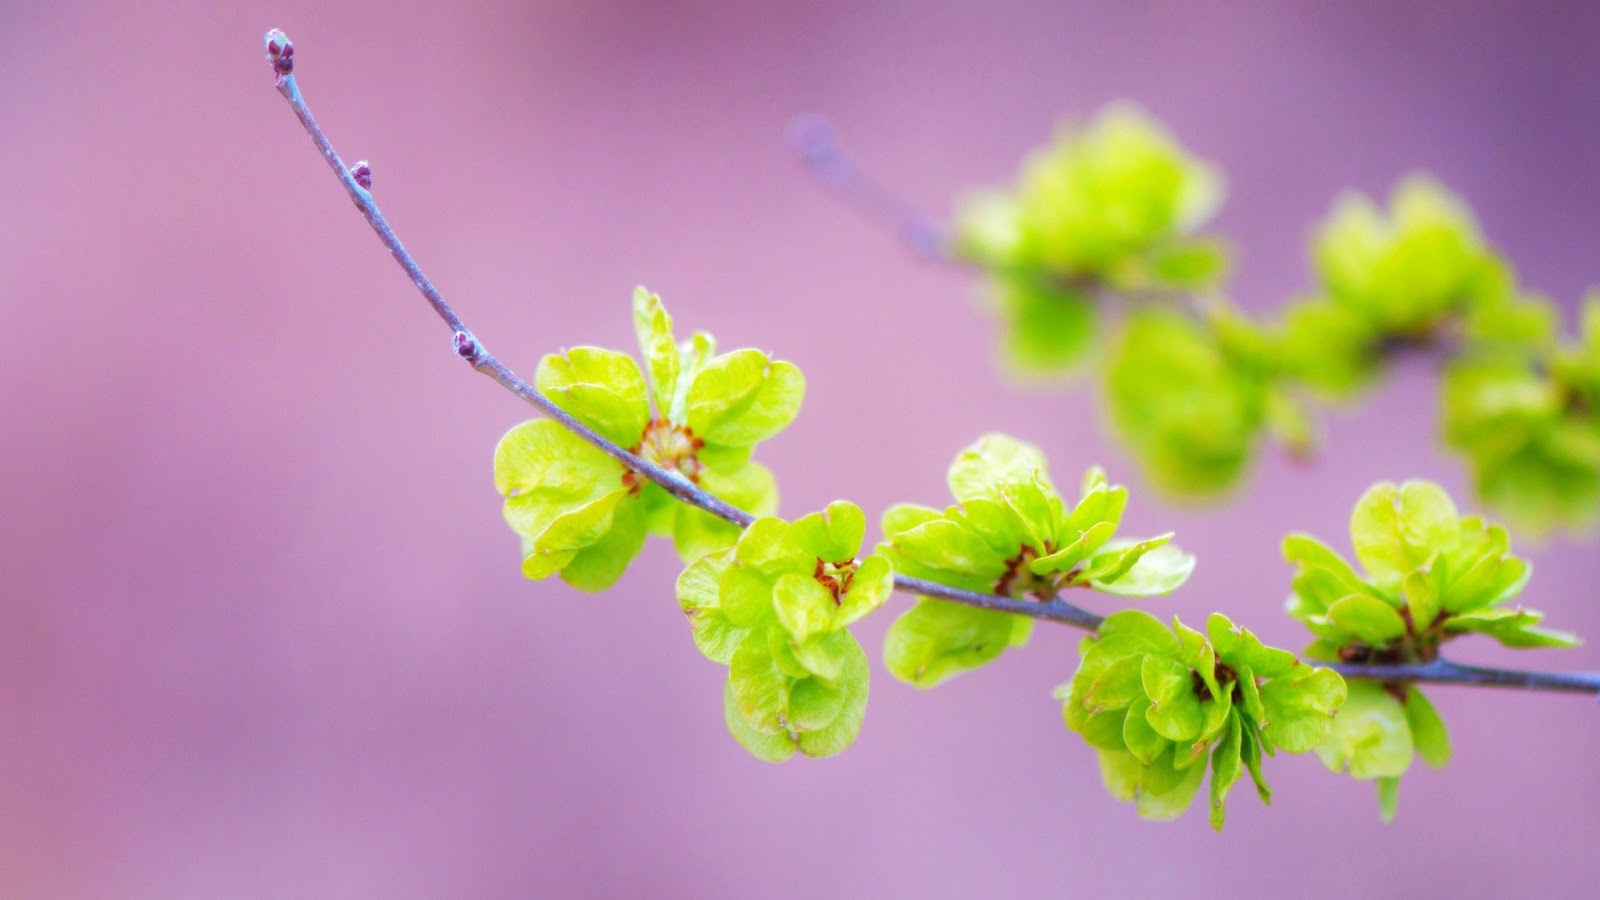 hinh-nen-hd-dep-cho-may-tinh-hoa-mai-small_green_flowers-wallpaper-2560x1440